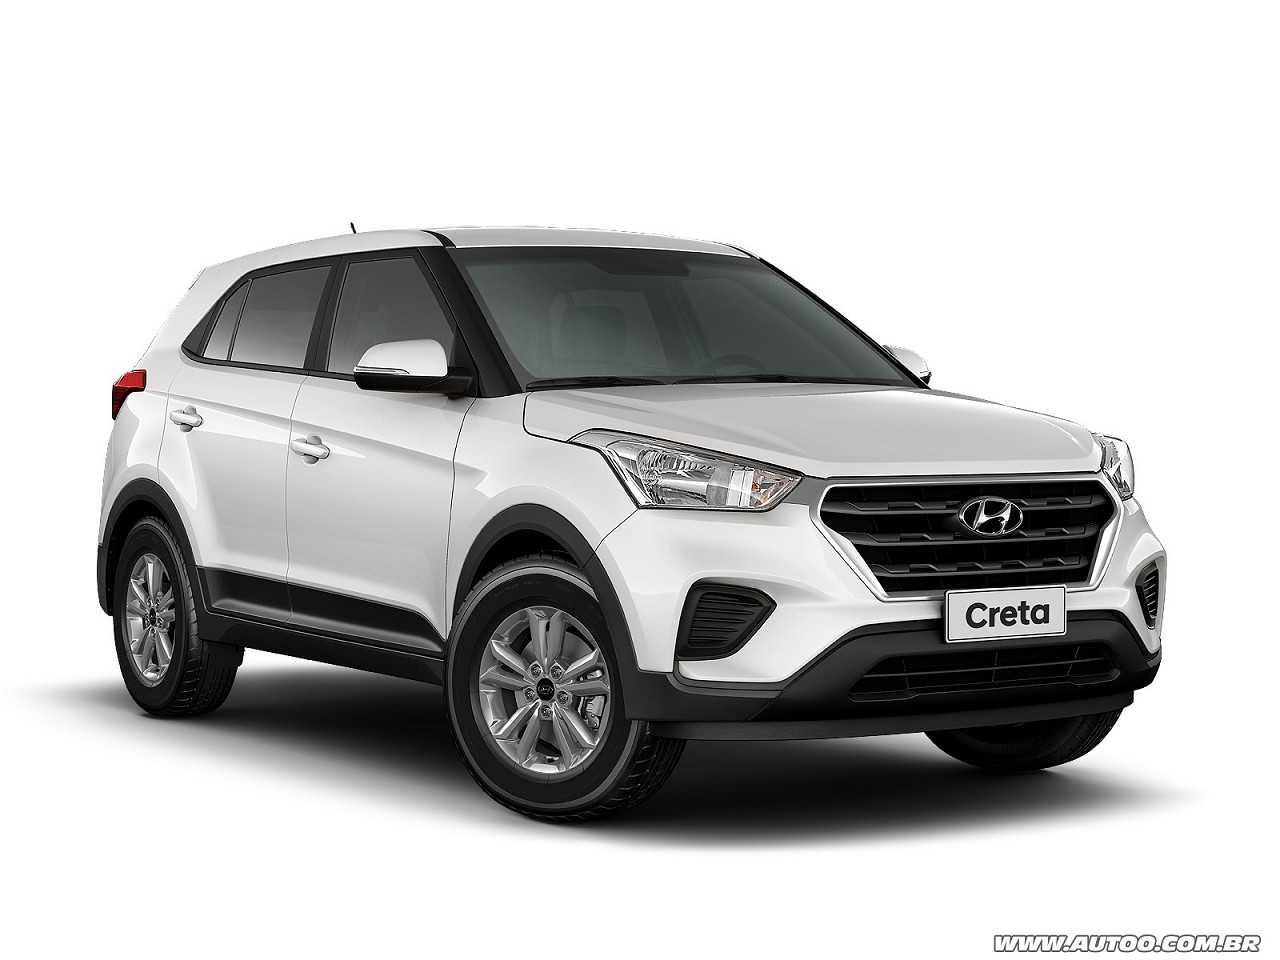 HyundaiCreta 2018 - ângulo frontal